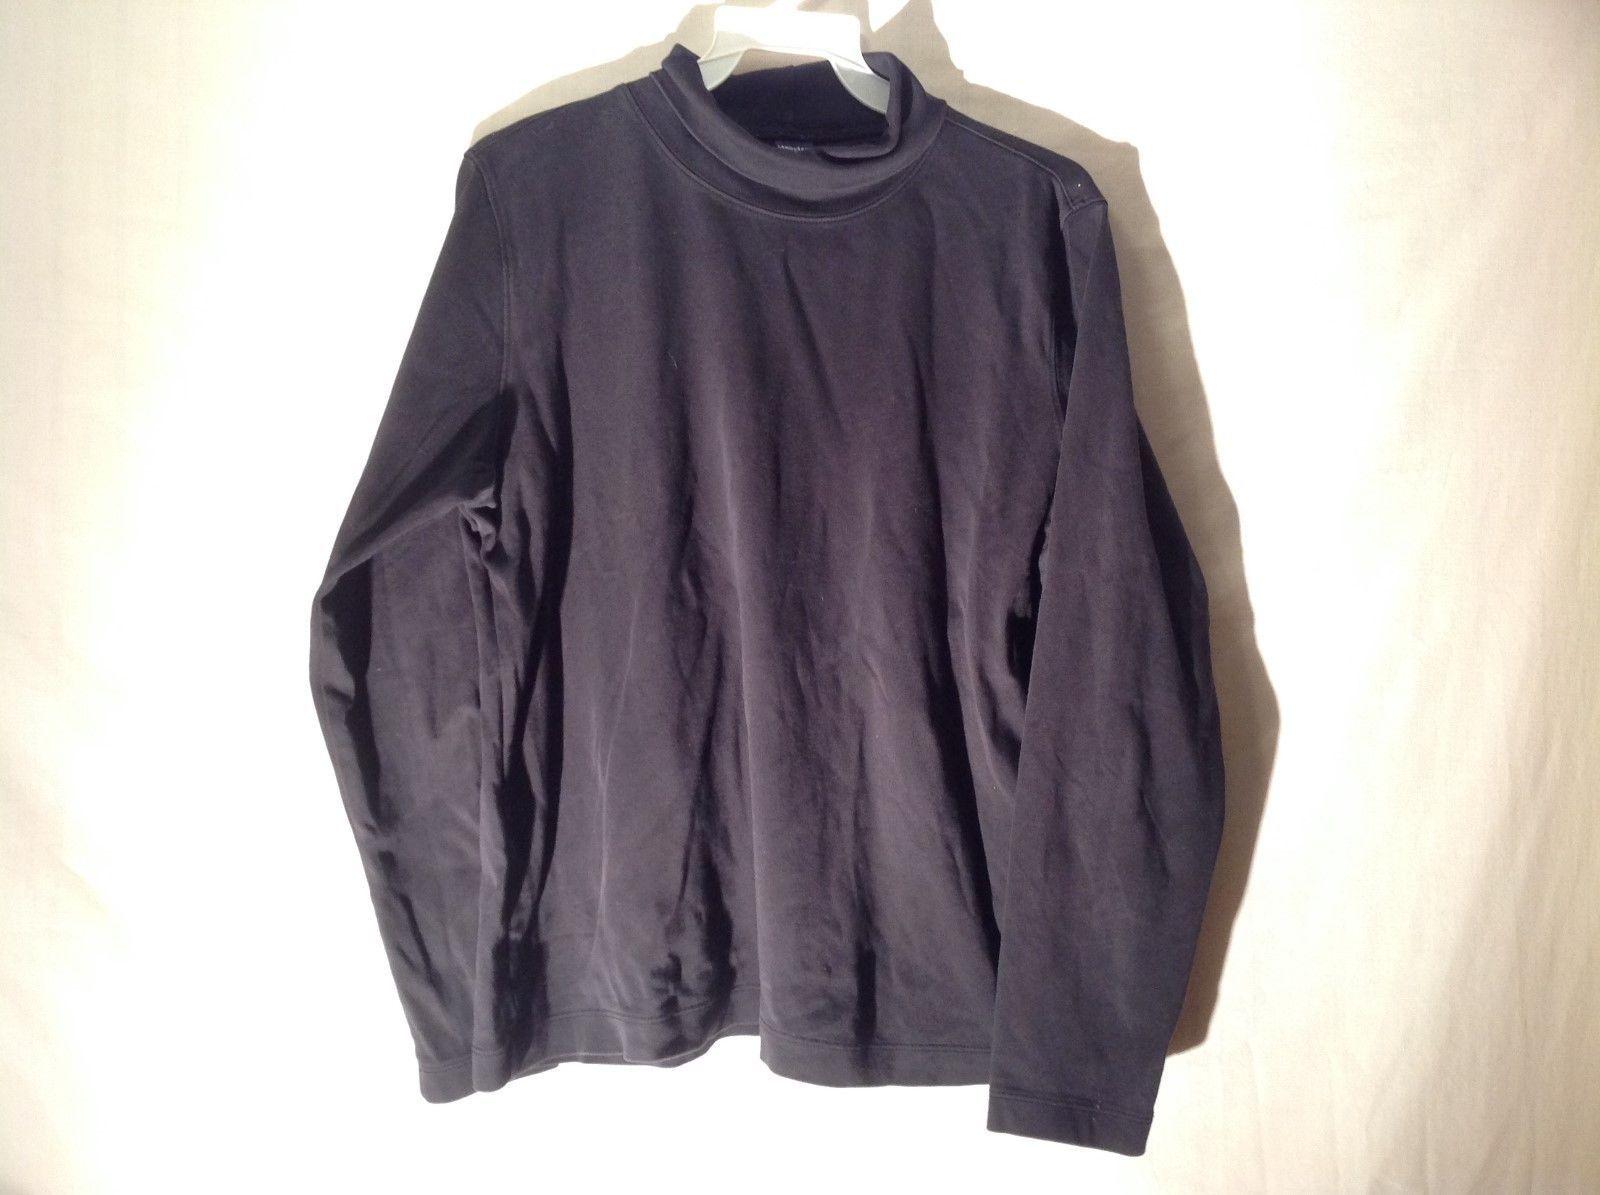 Women's Land's End Black turtle neck Sweatshirt